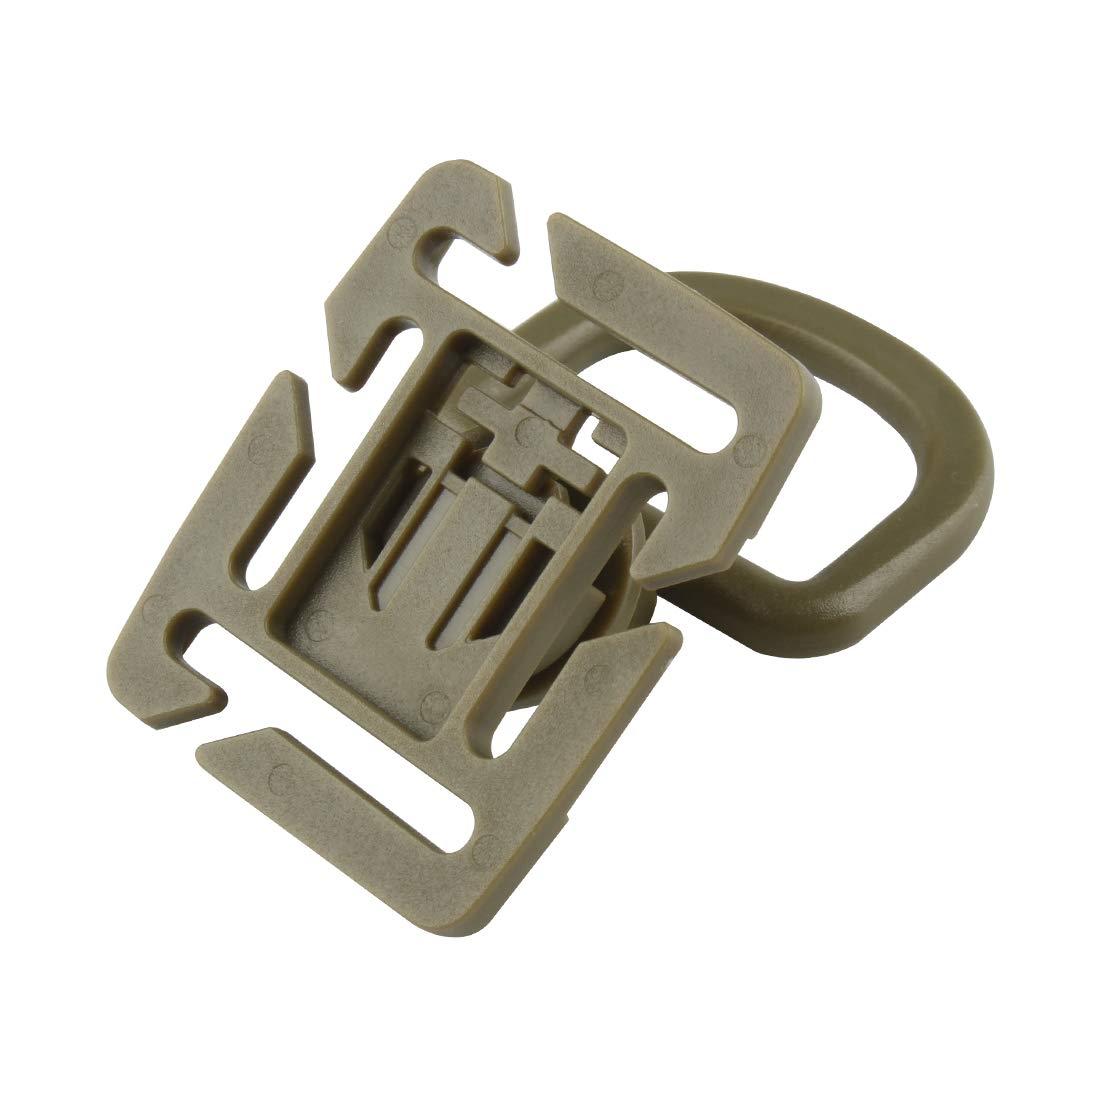 6 St/ück Taktisch Molle Buckle D-Ring 360 Rotation Clips Karabiner Rucksack Schnalle f/ür Gurt 18-25mm JMGK-01